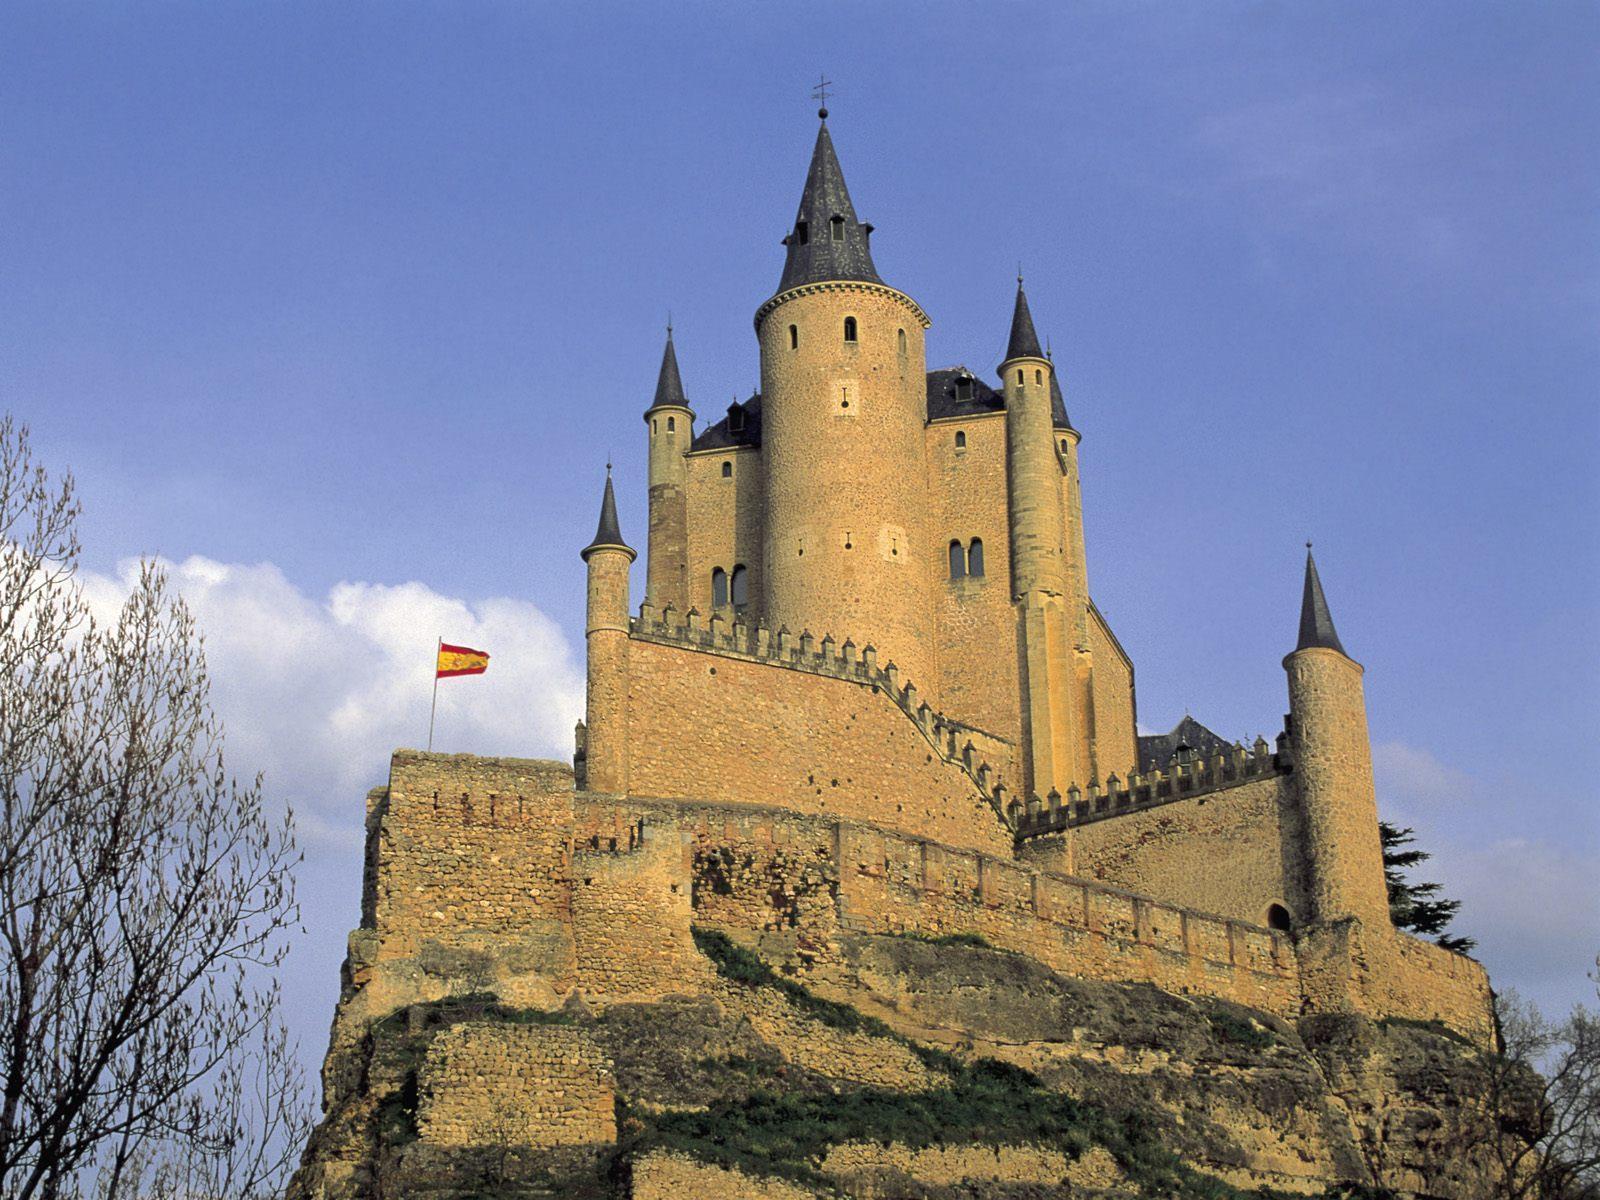 Espagne_Alcazar-Tower-Segovia-Spain